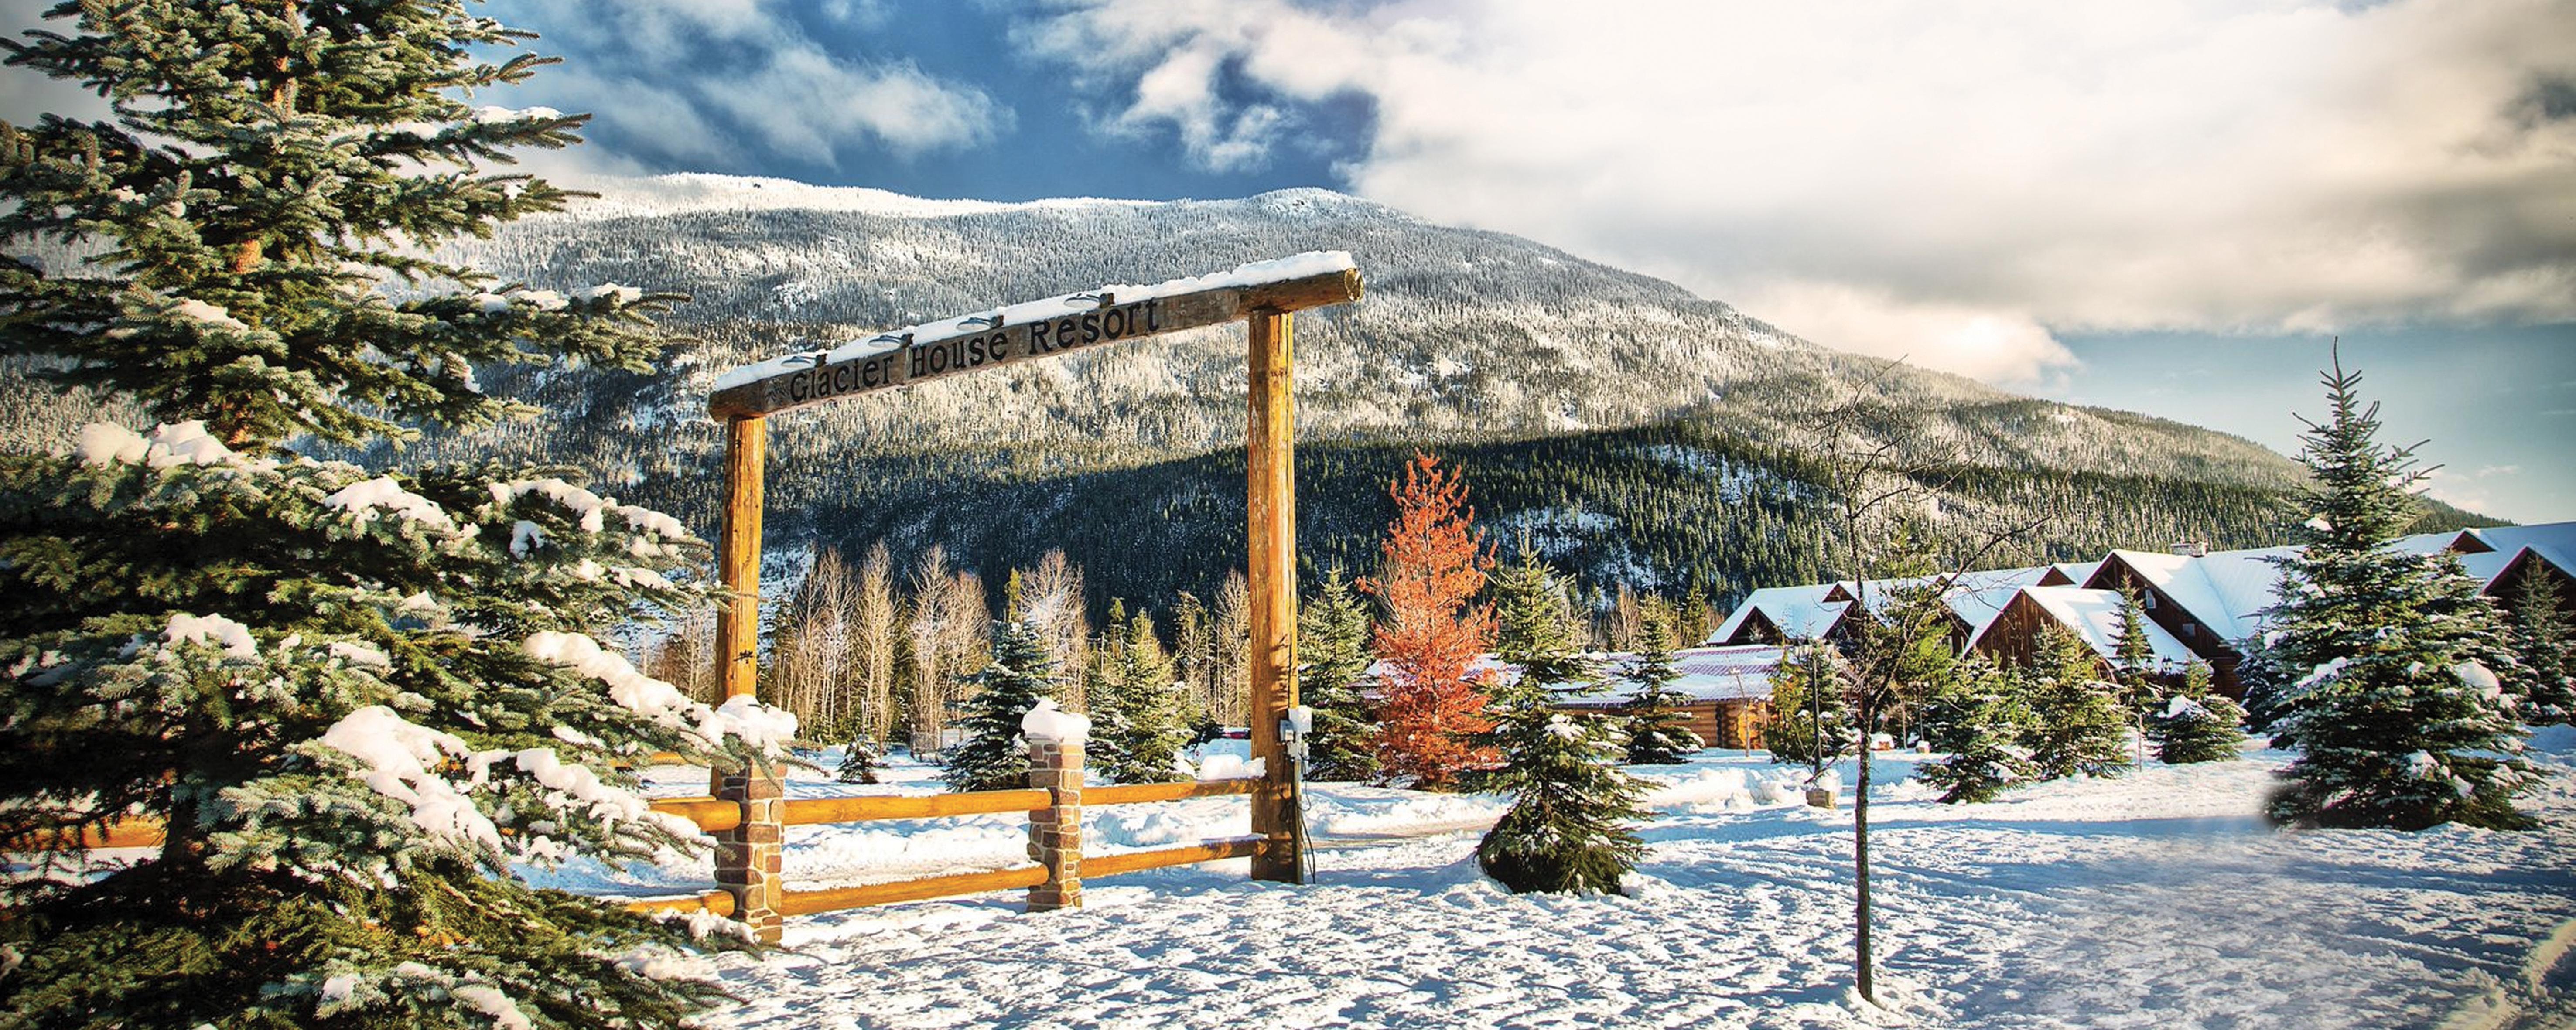 Glacier House Resort in winter